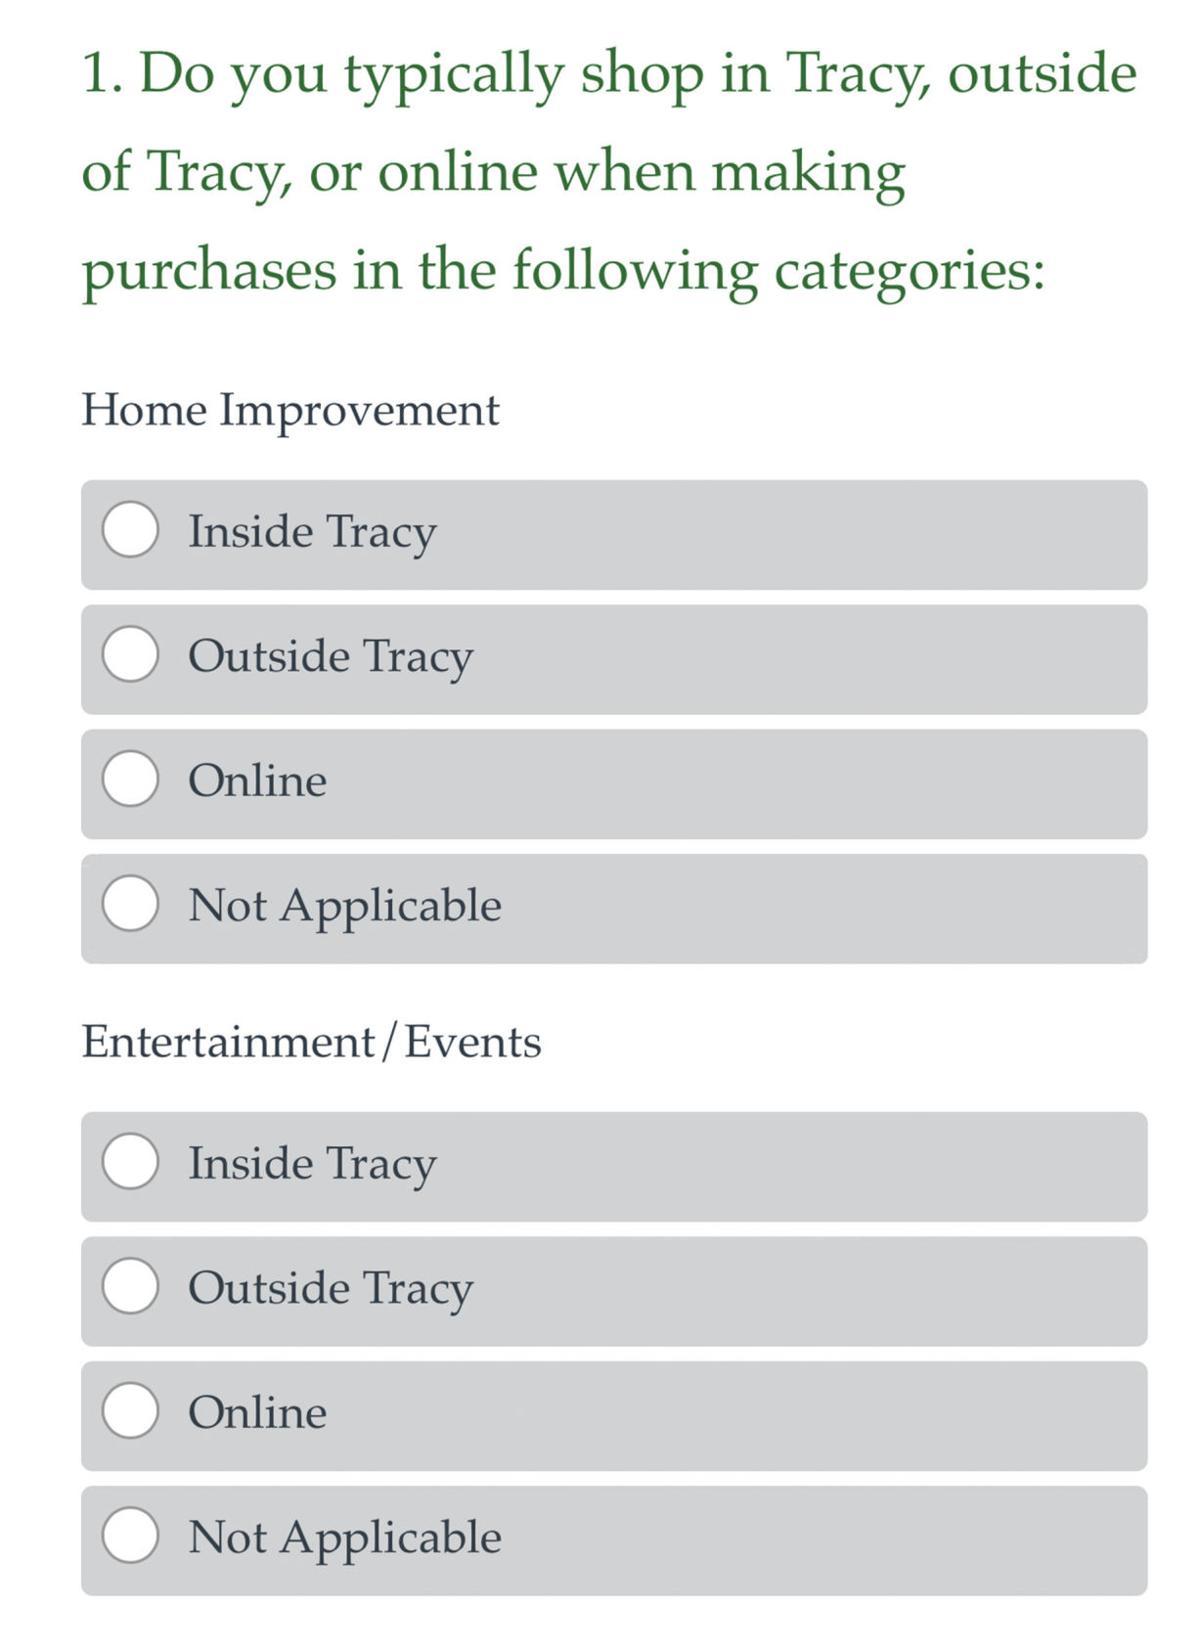 2019 Retail Survey